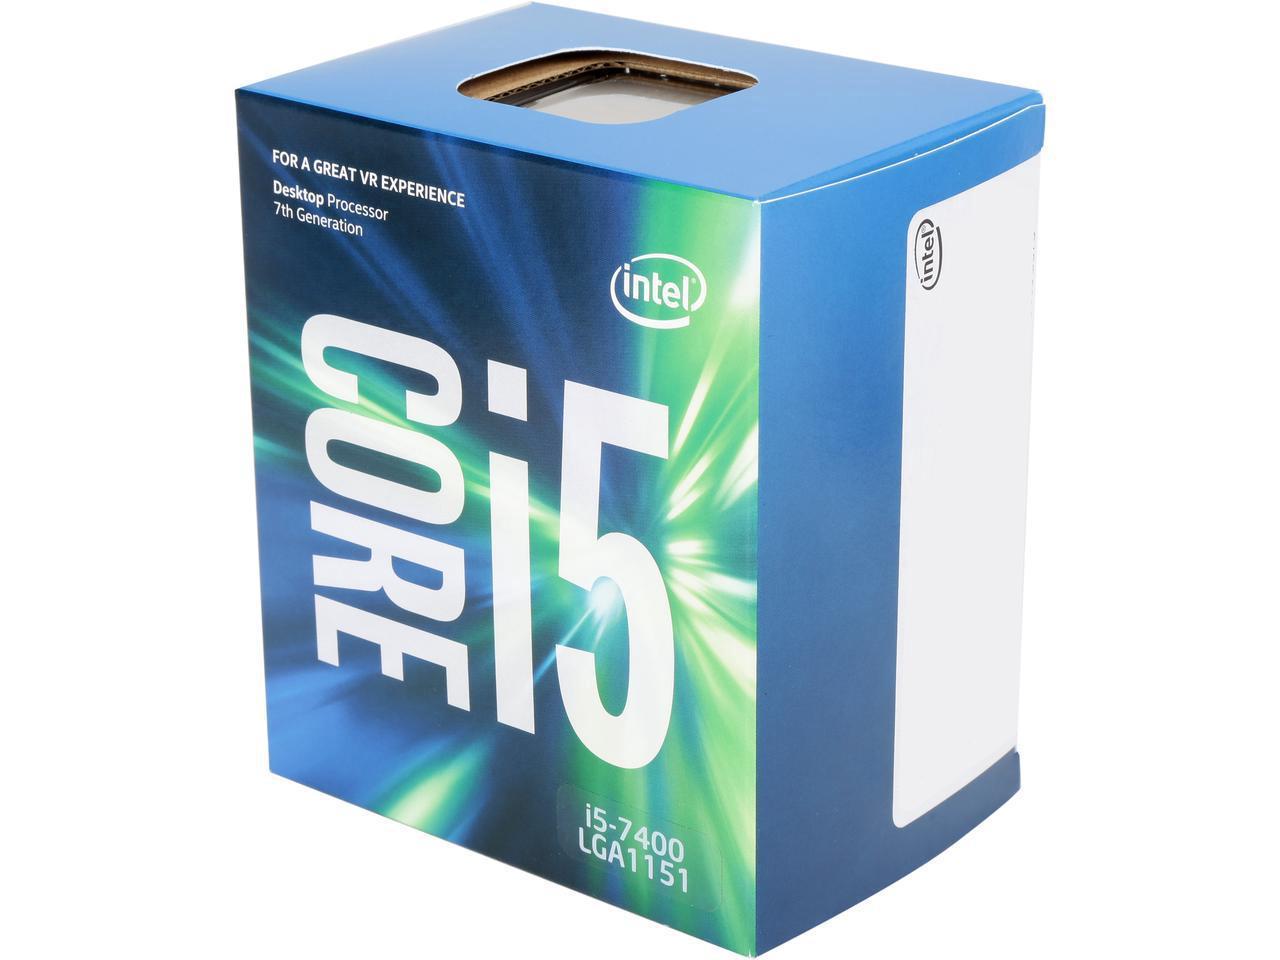 Процесор Intel Kaby Lake Core i5-7400 3.0GHz, 6MB, 65W LGA1151